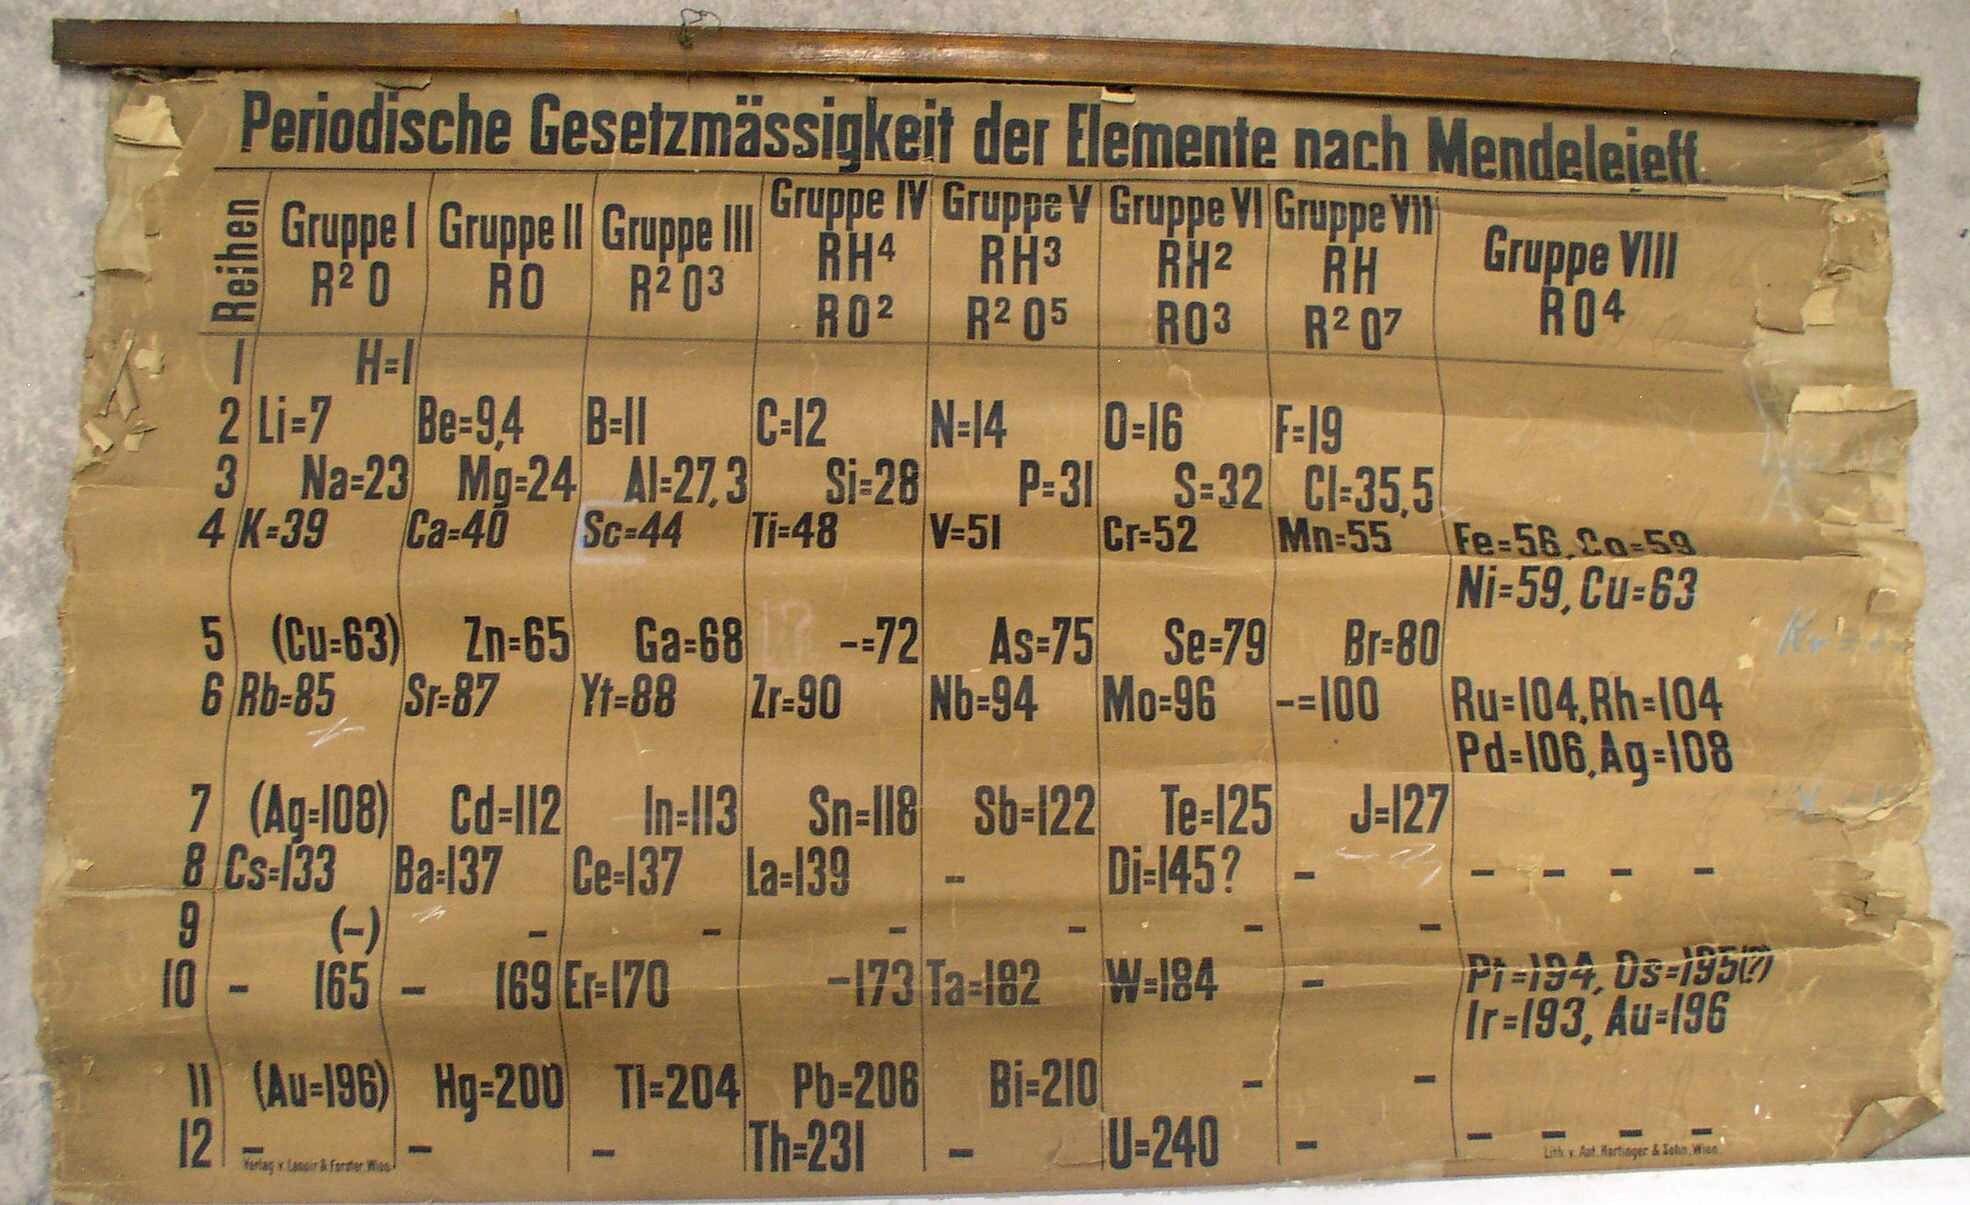 Verdens eldste kjente periodesystem. Foto